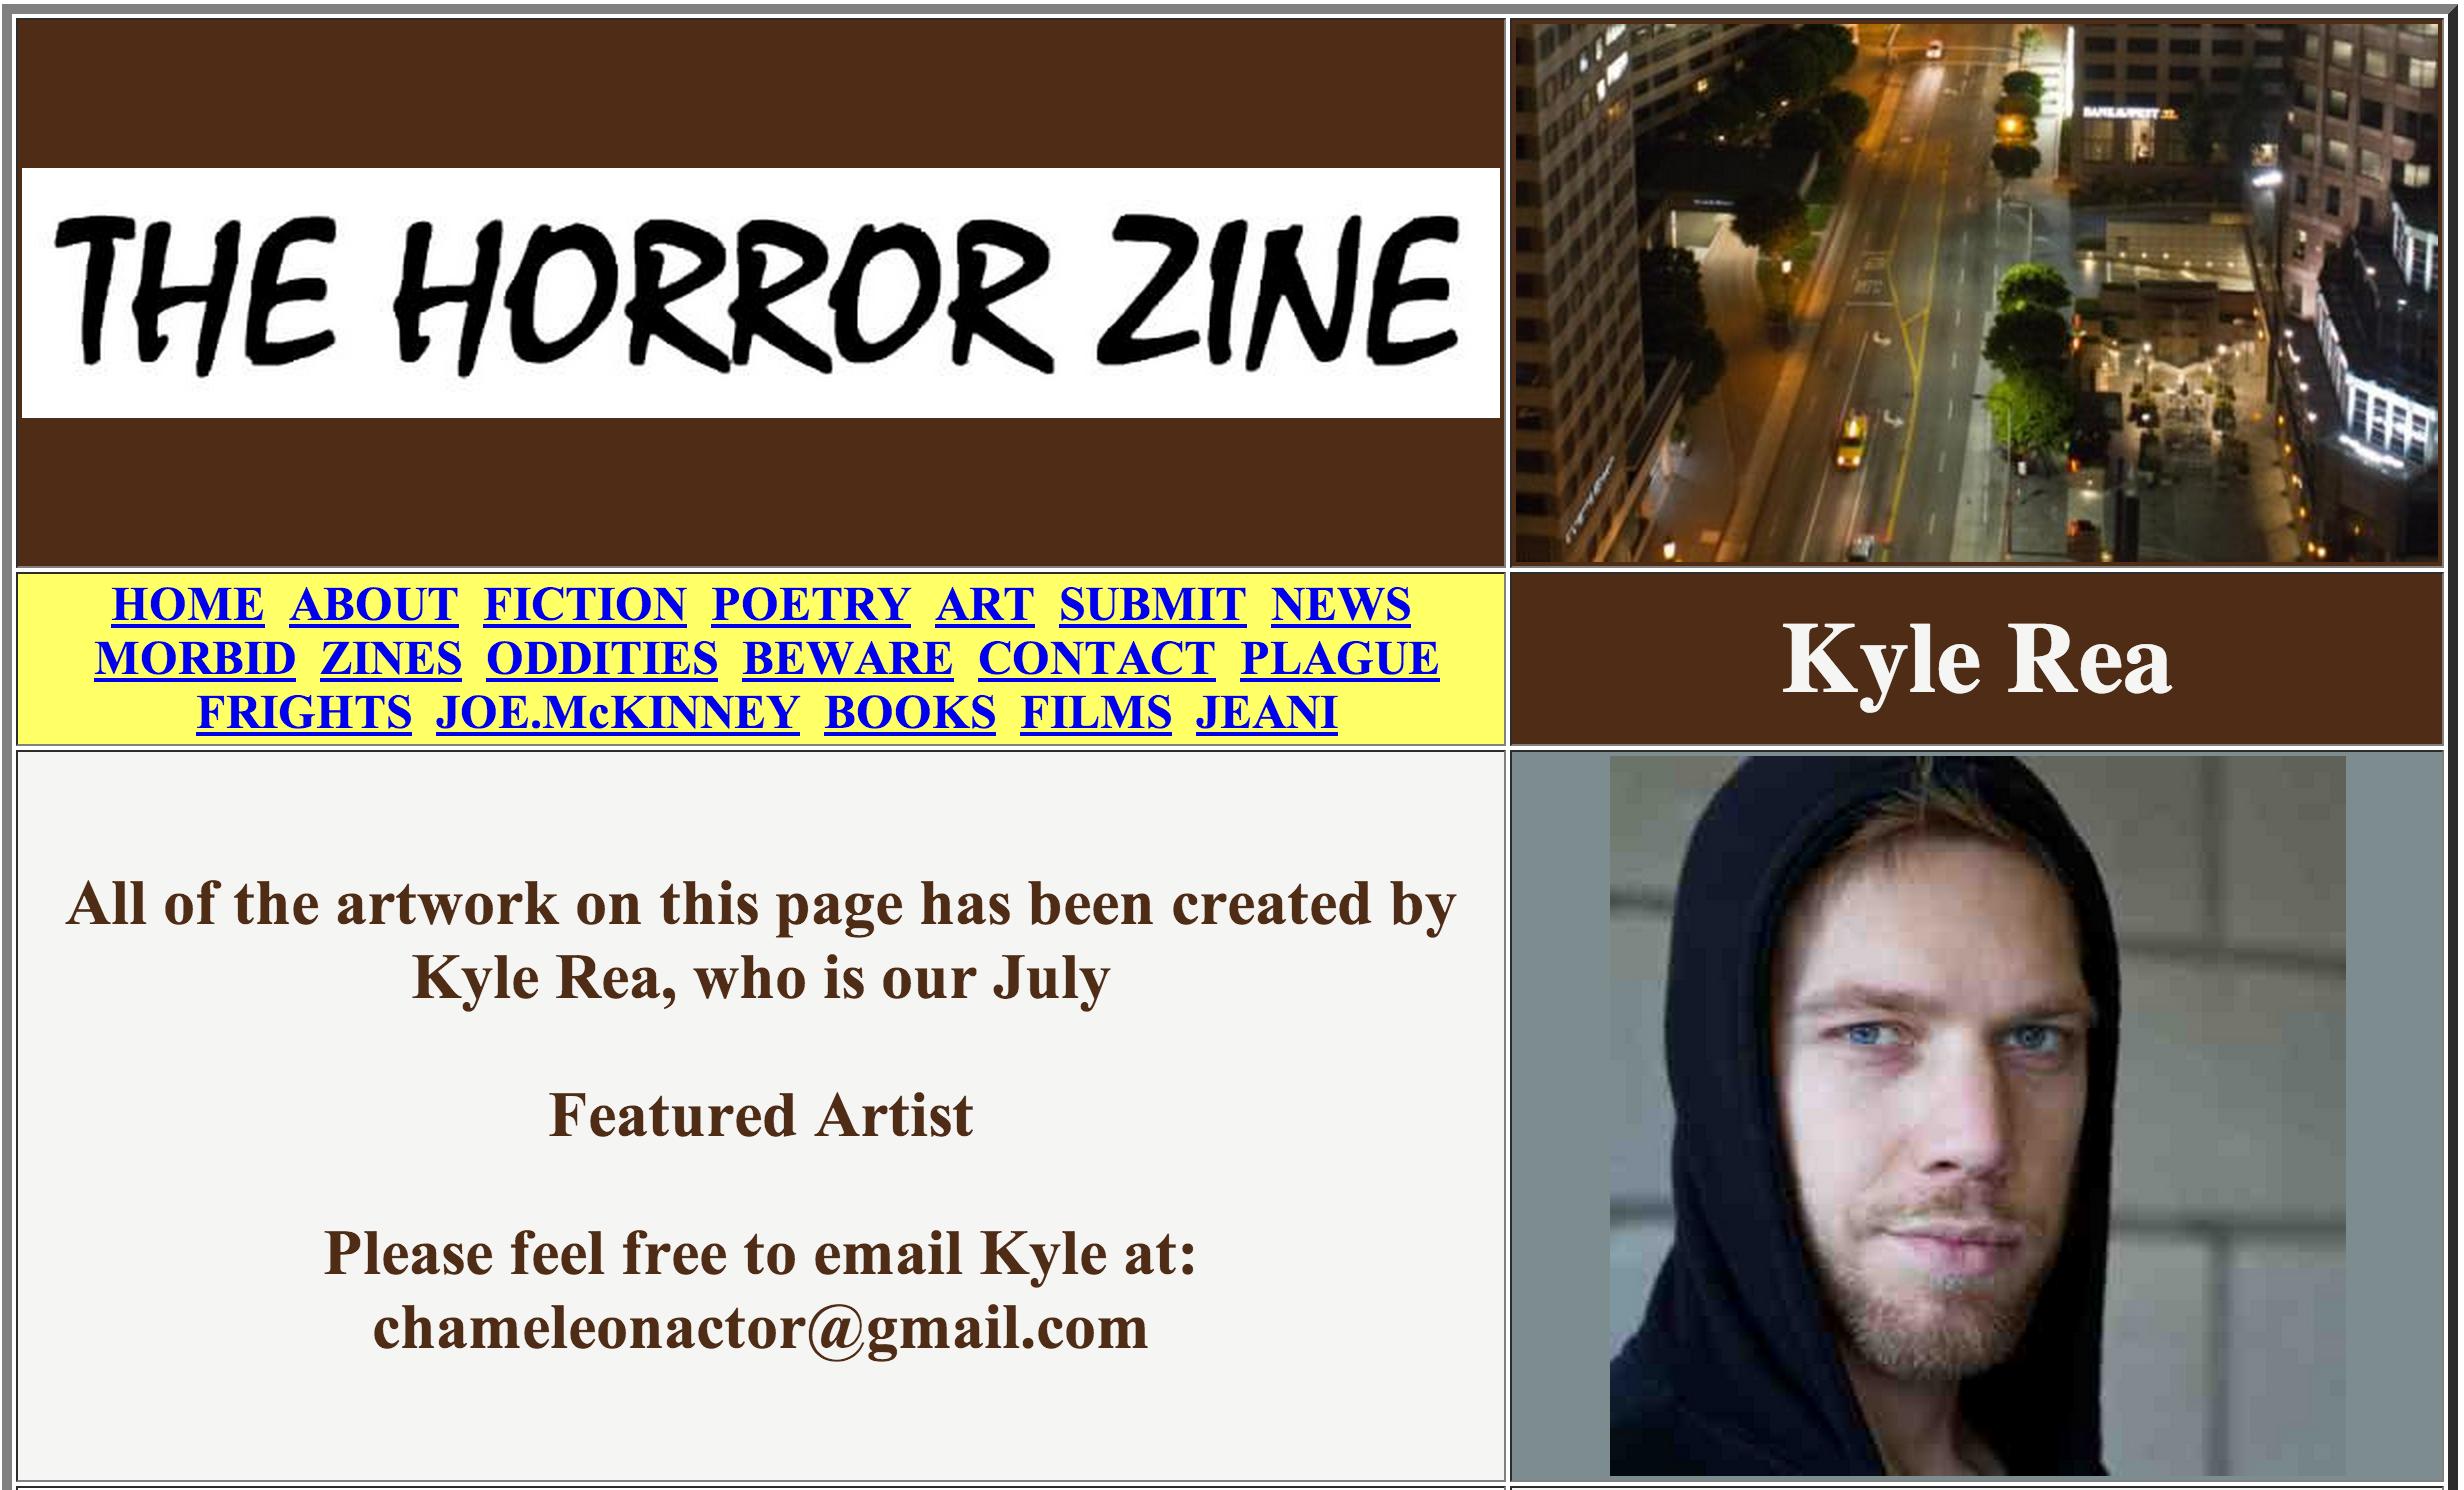 Kyle Rea Photography - The Horrorzine Publication